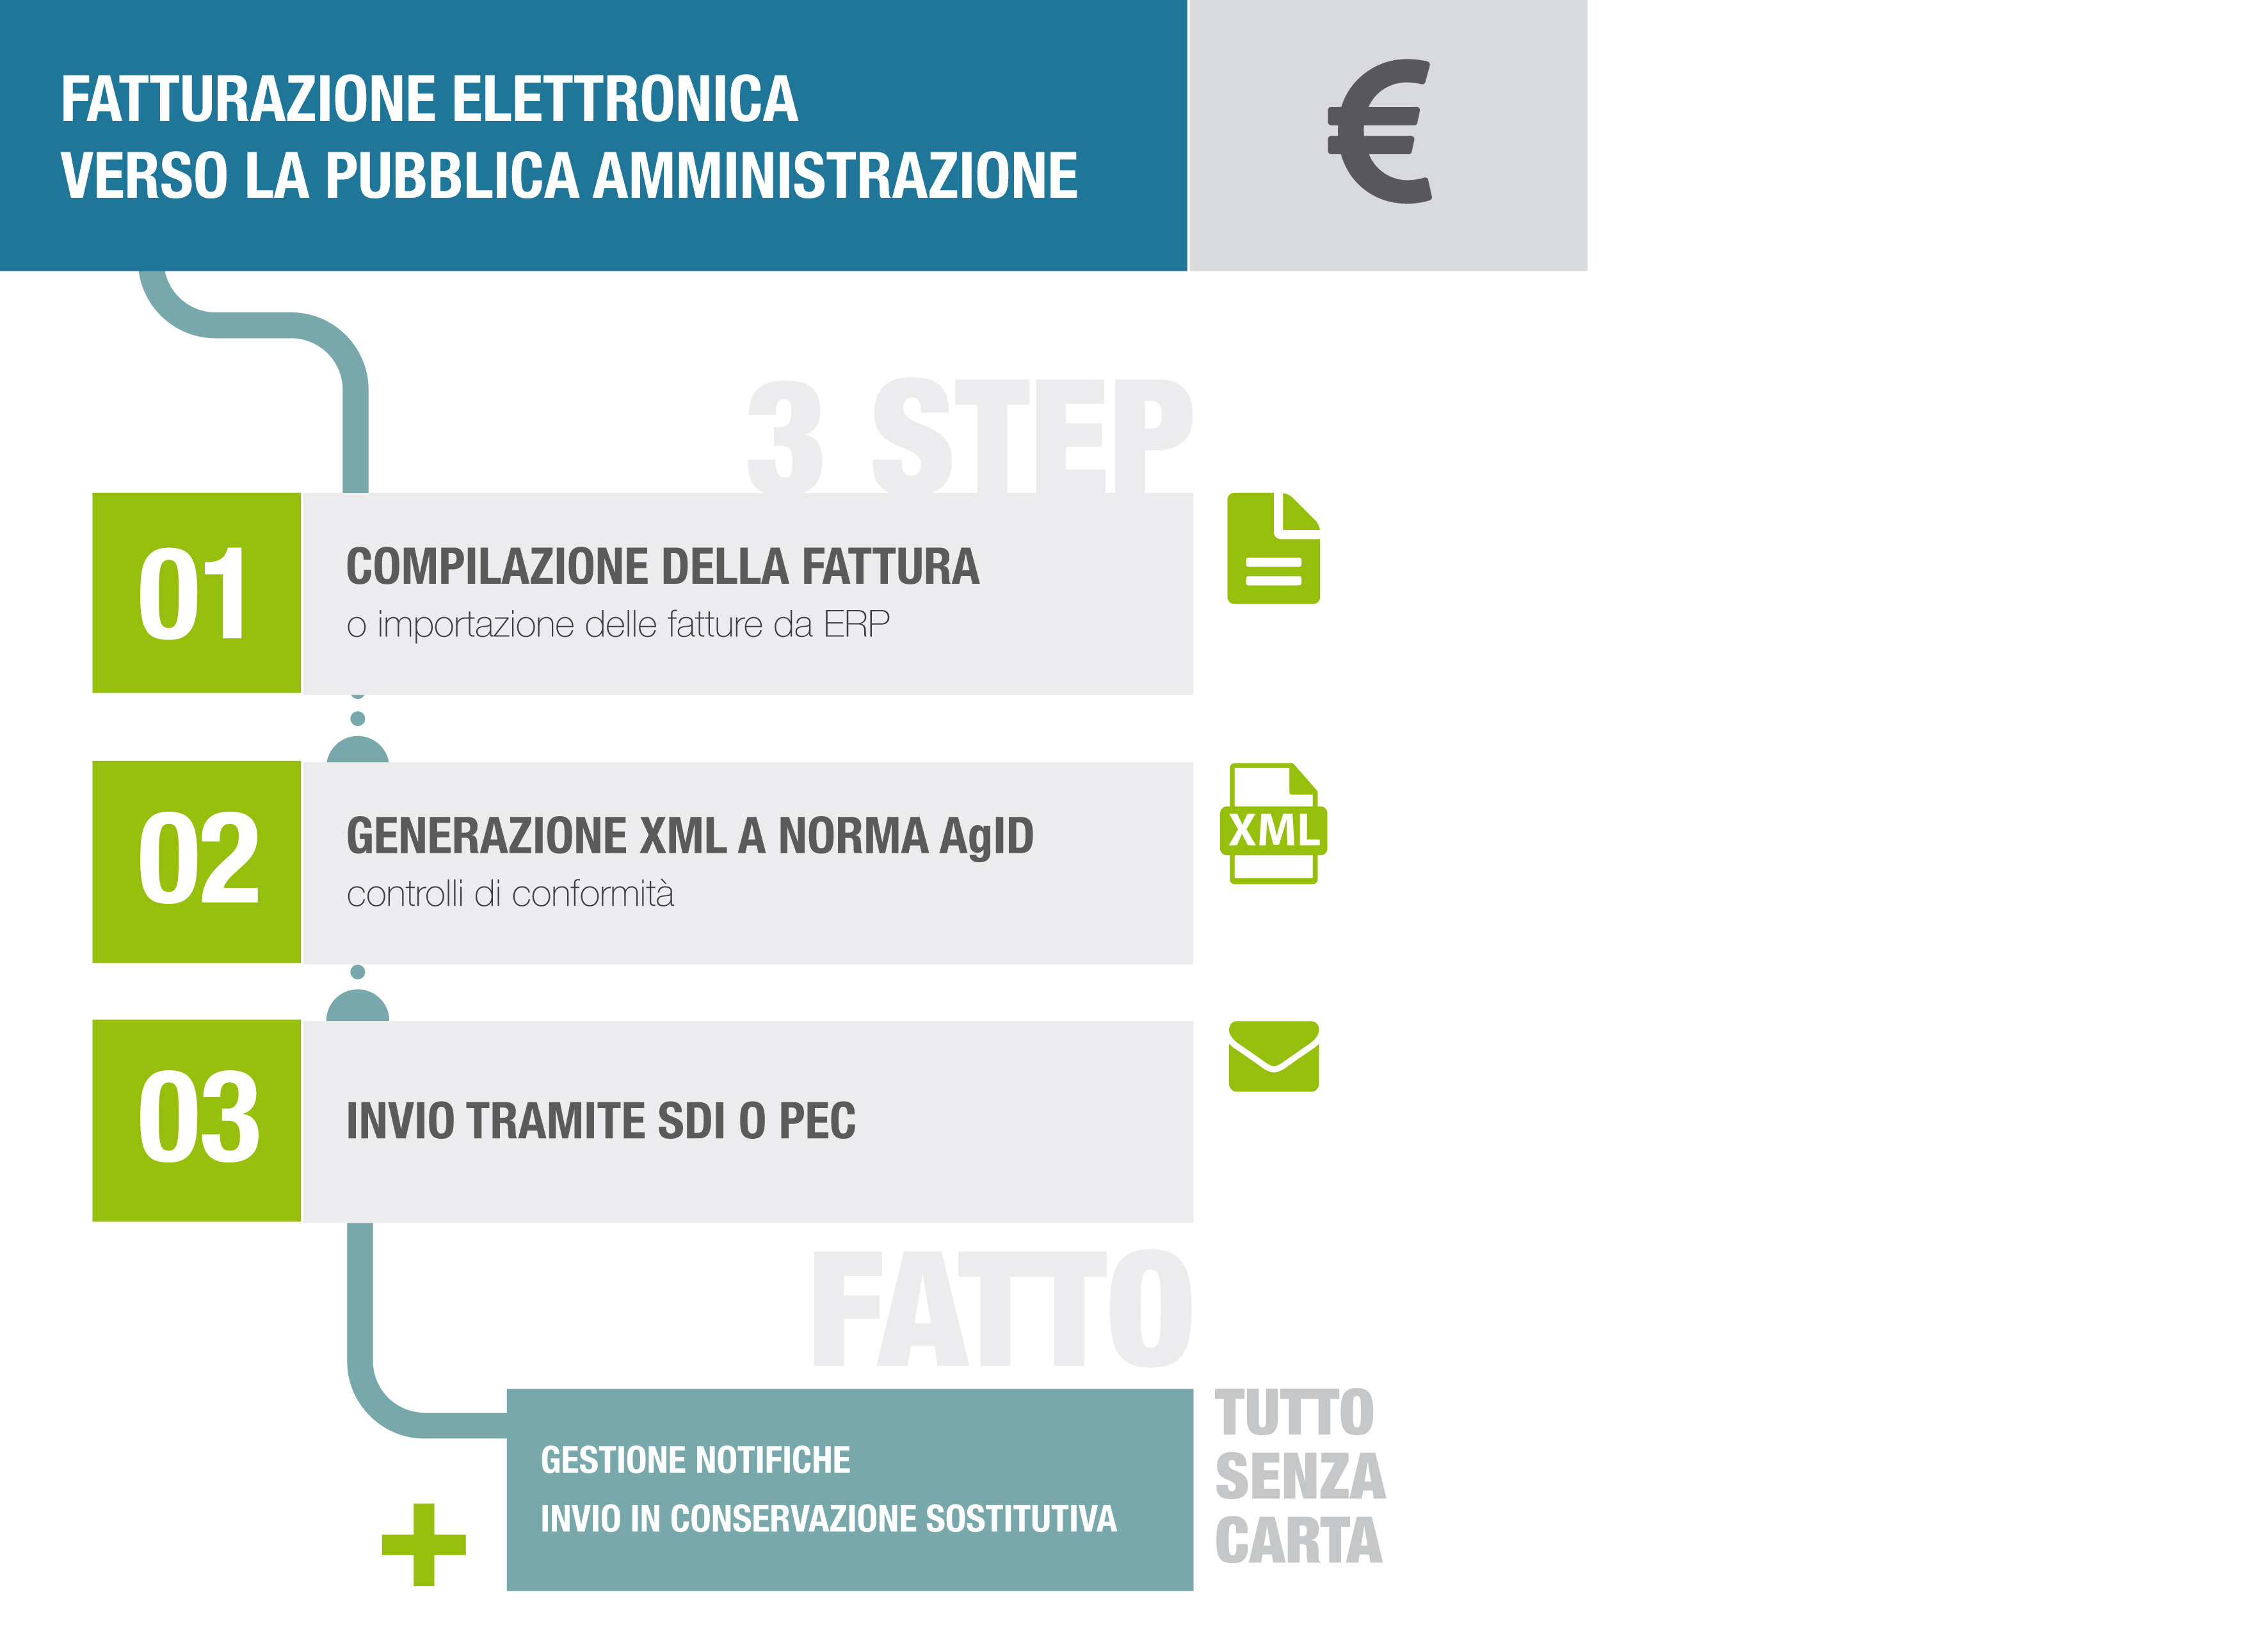 infografica-fattura-elettronica-mdm